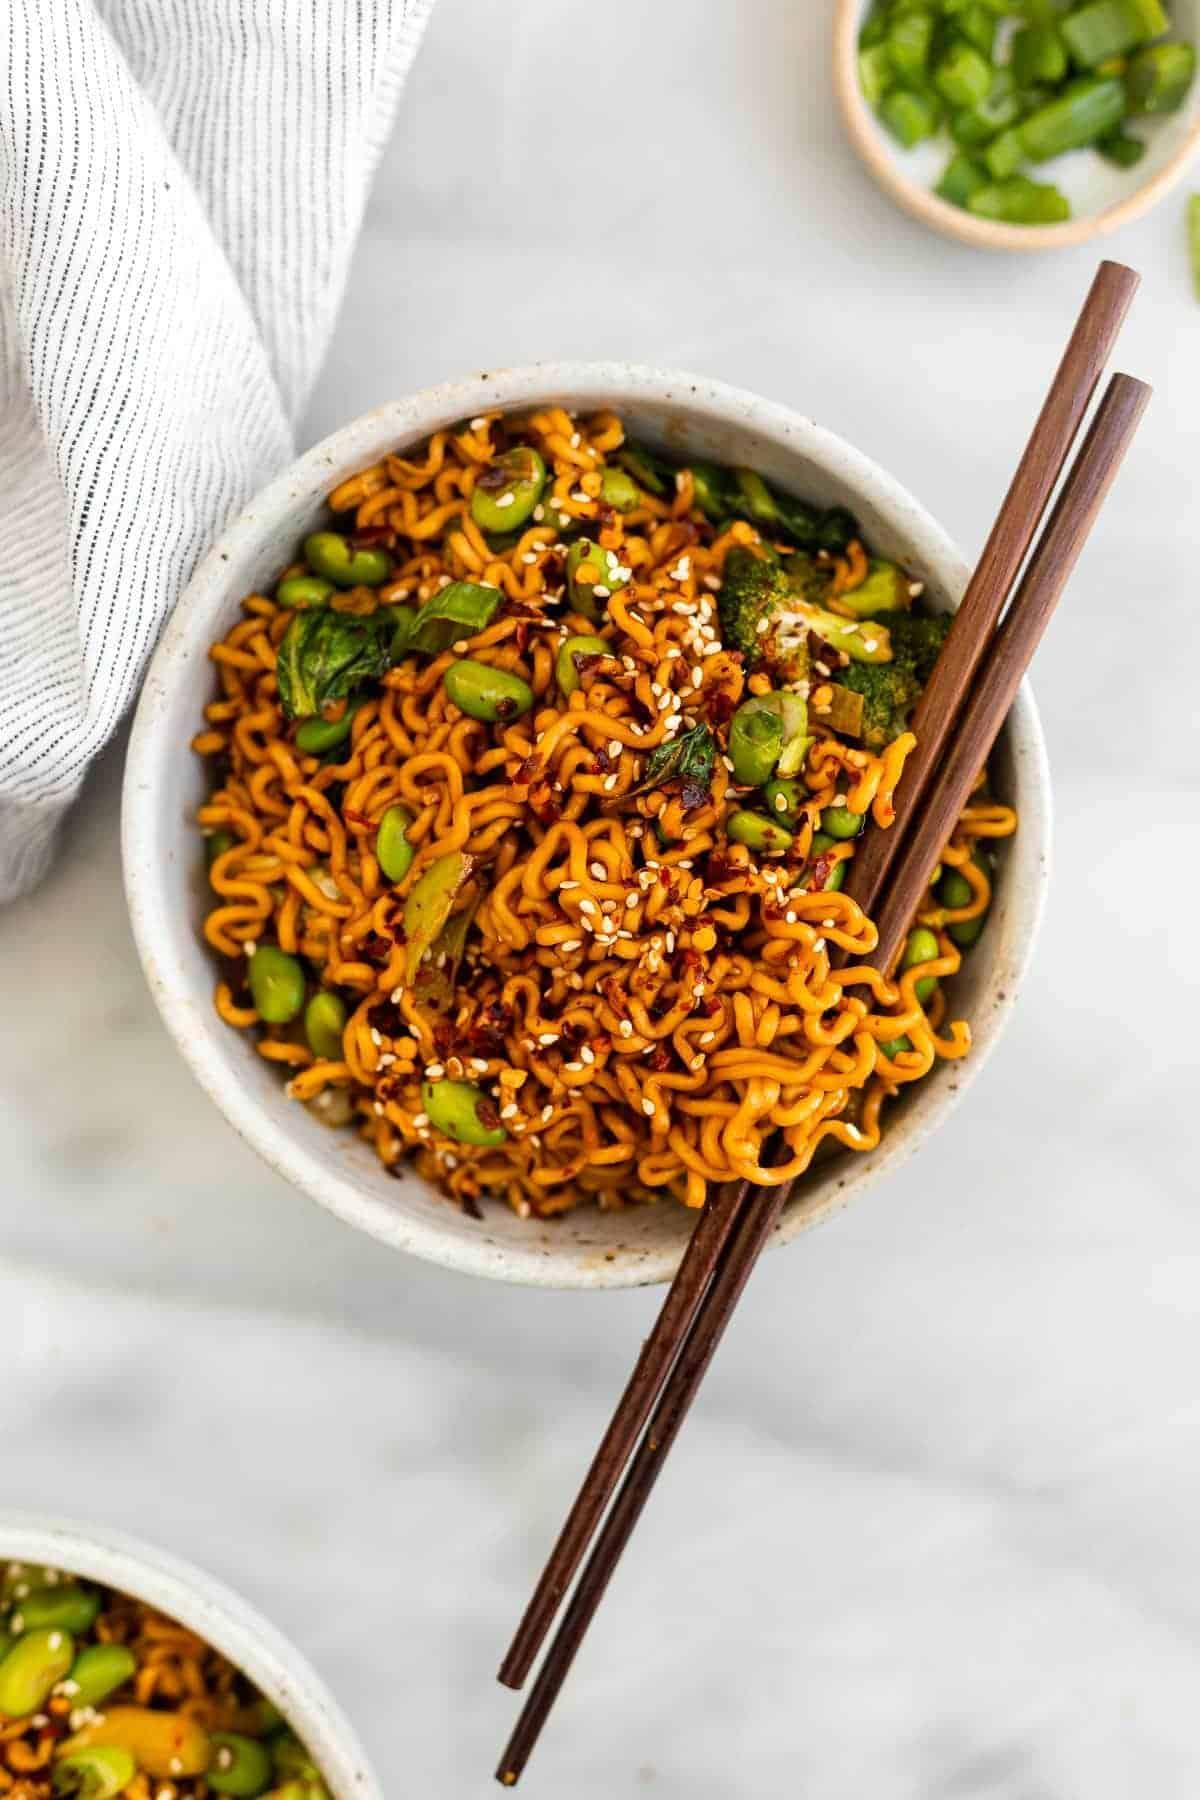 ramen noodle stir fry with edamame